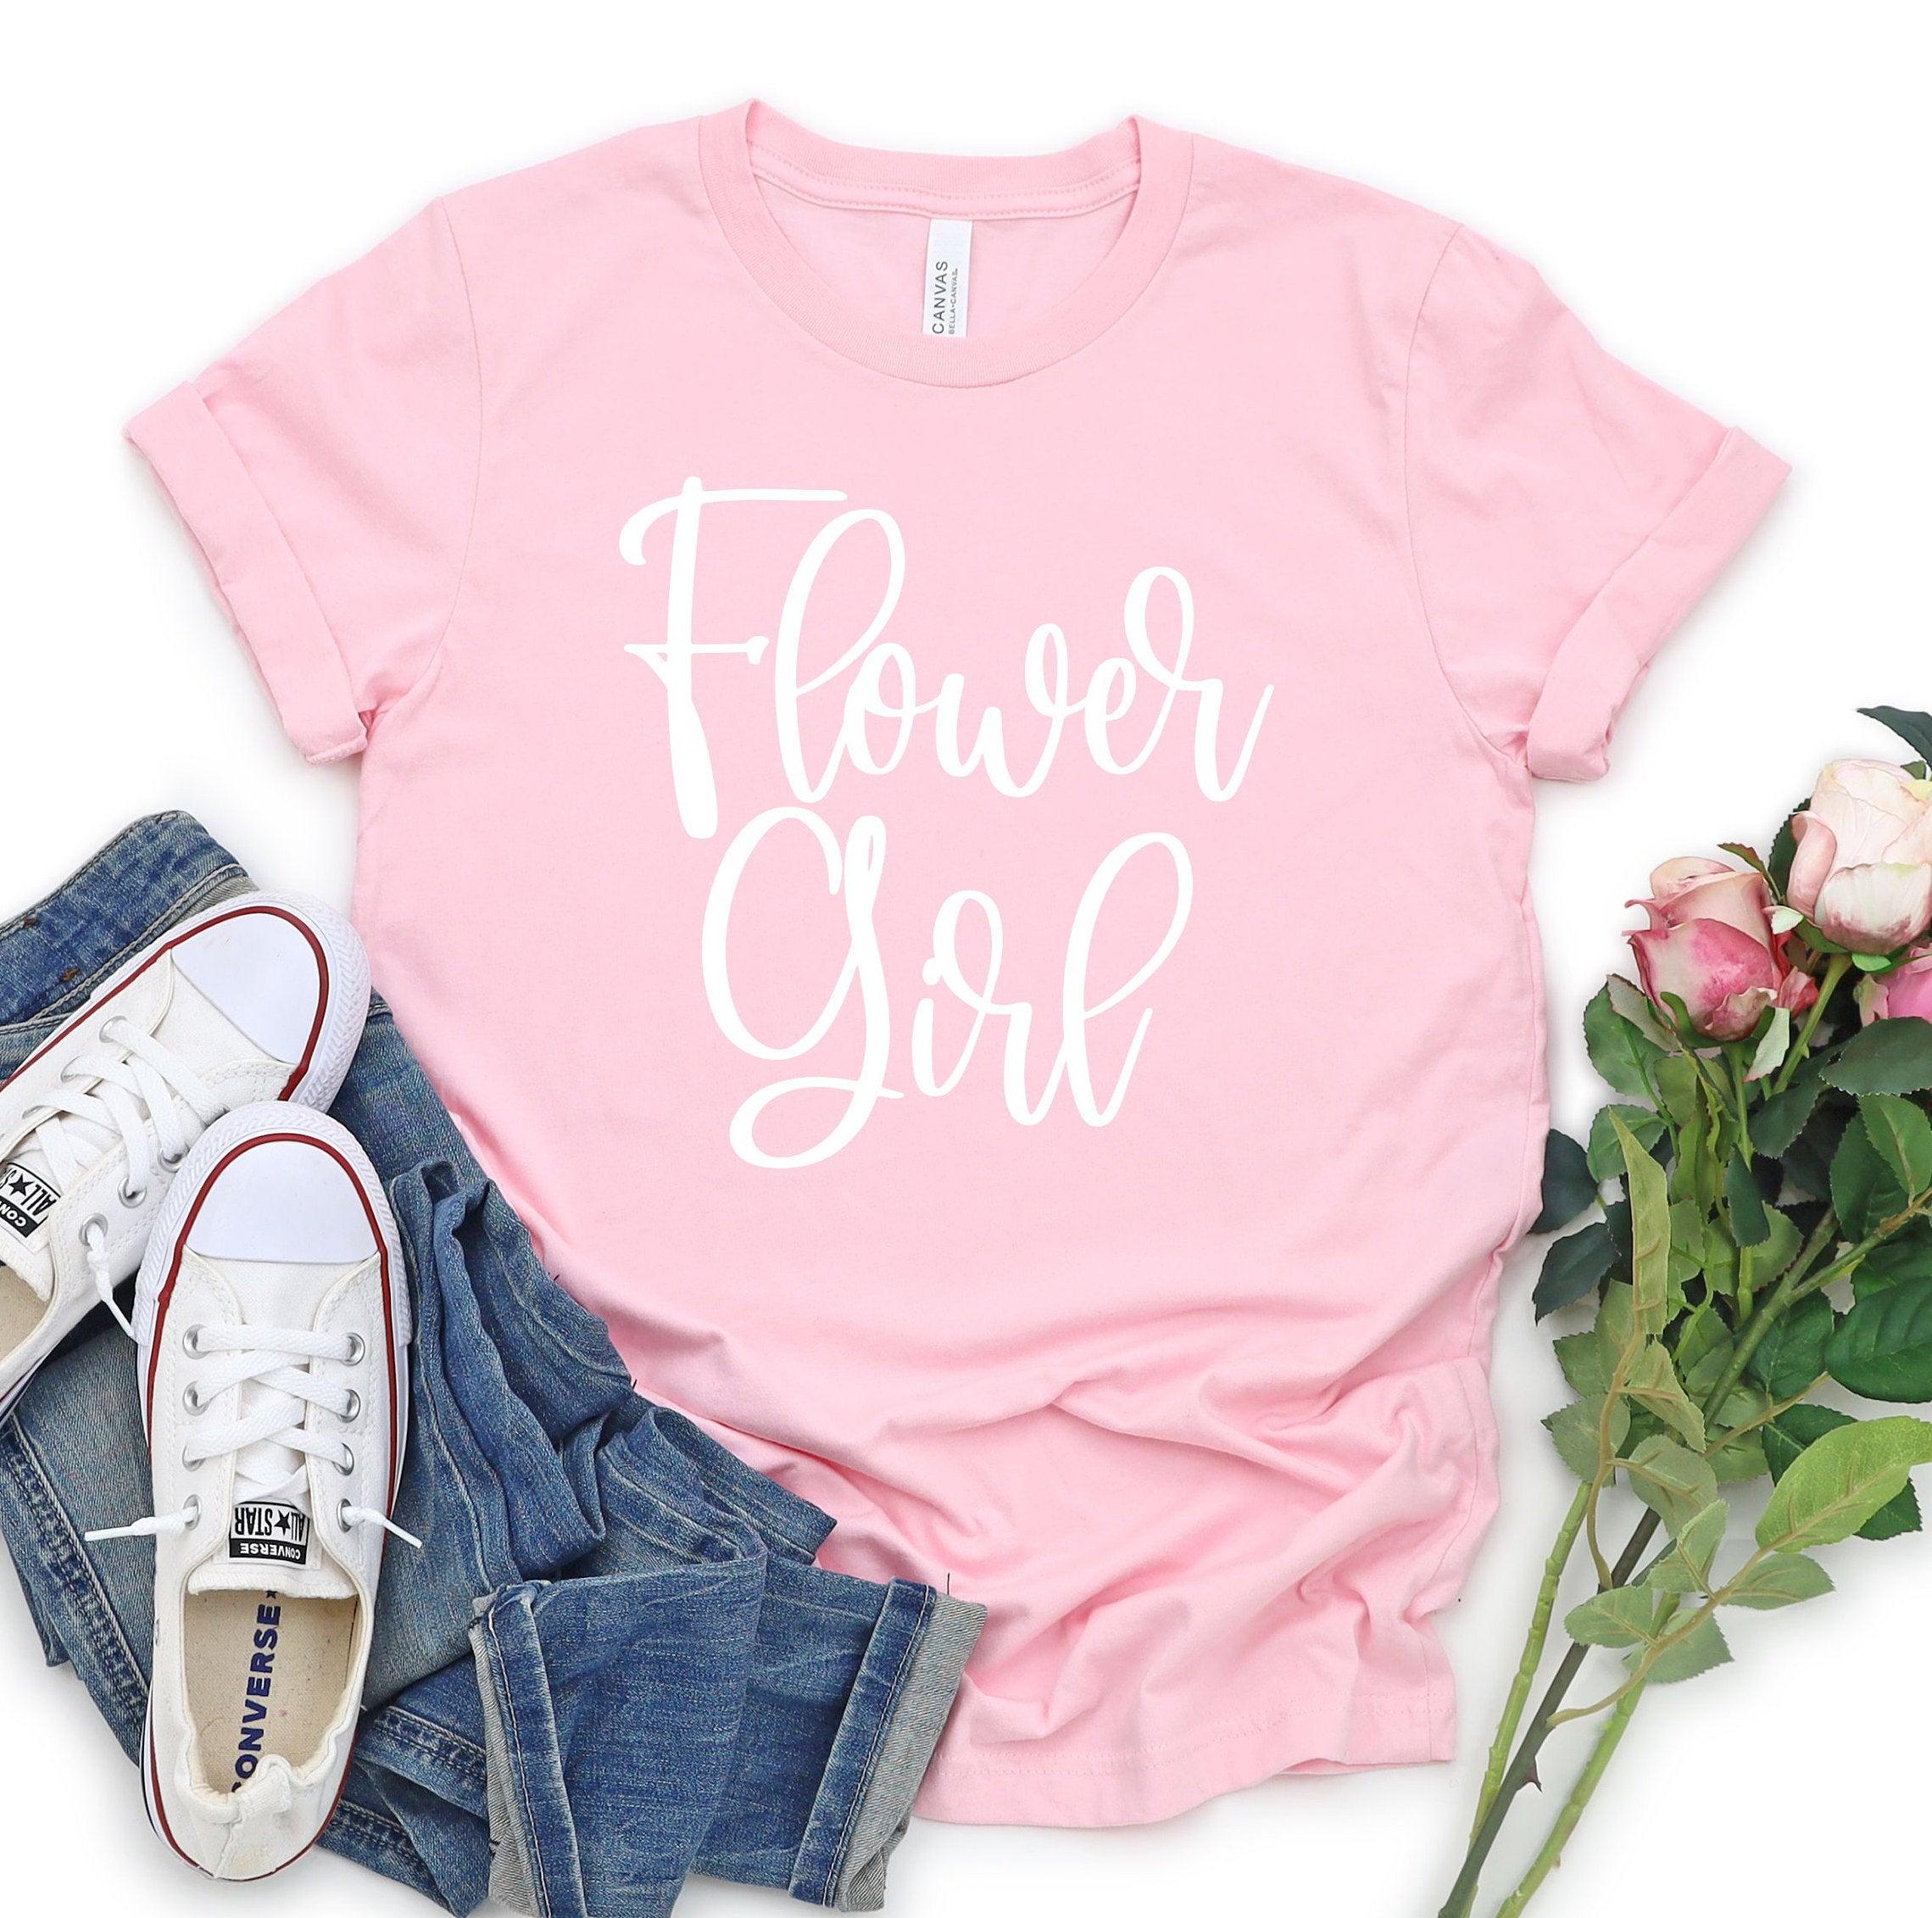 Flower-girl-svg-bridal-cut-files-bridesmaid-svg-bridal-party-svg-bachelorette-svg-bridal-svg-designs-wedding-cut-files-svg-for-cricut-60514b27